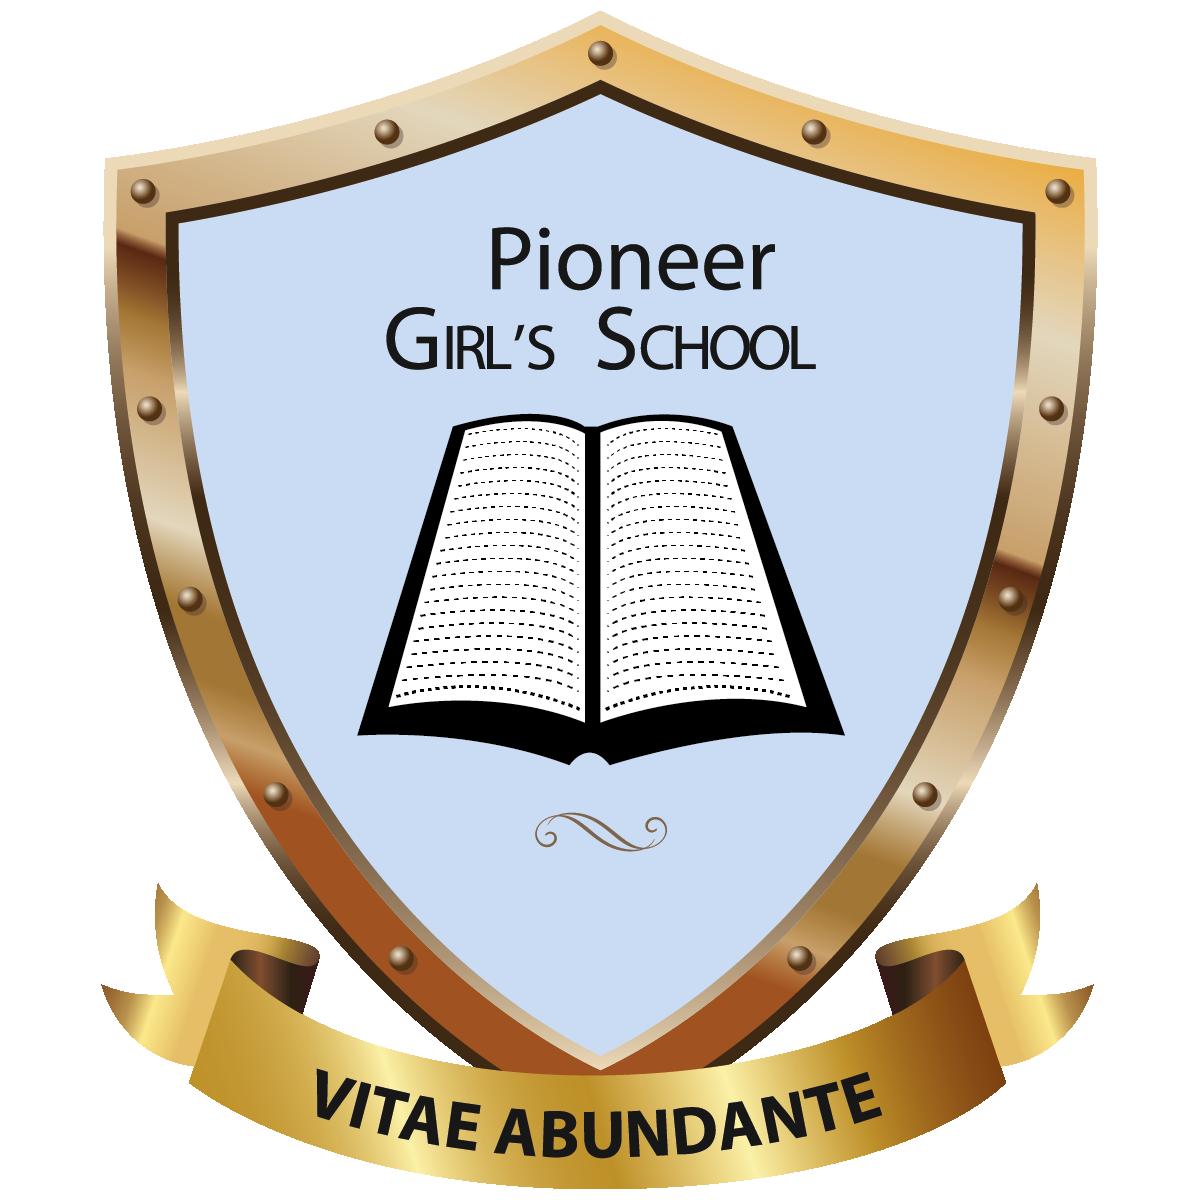 PIONEER GIRLS SCHOOL